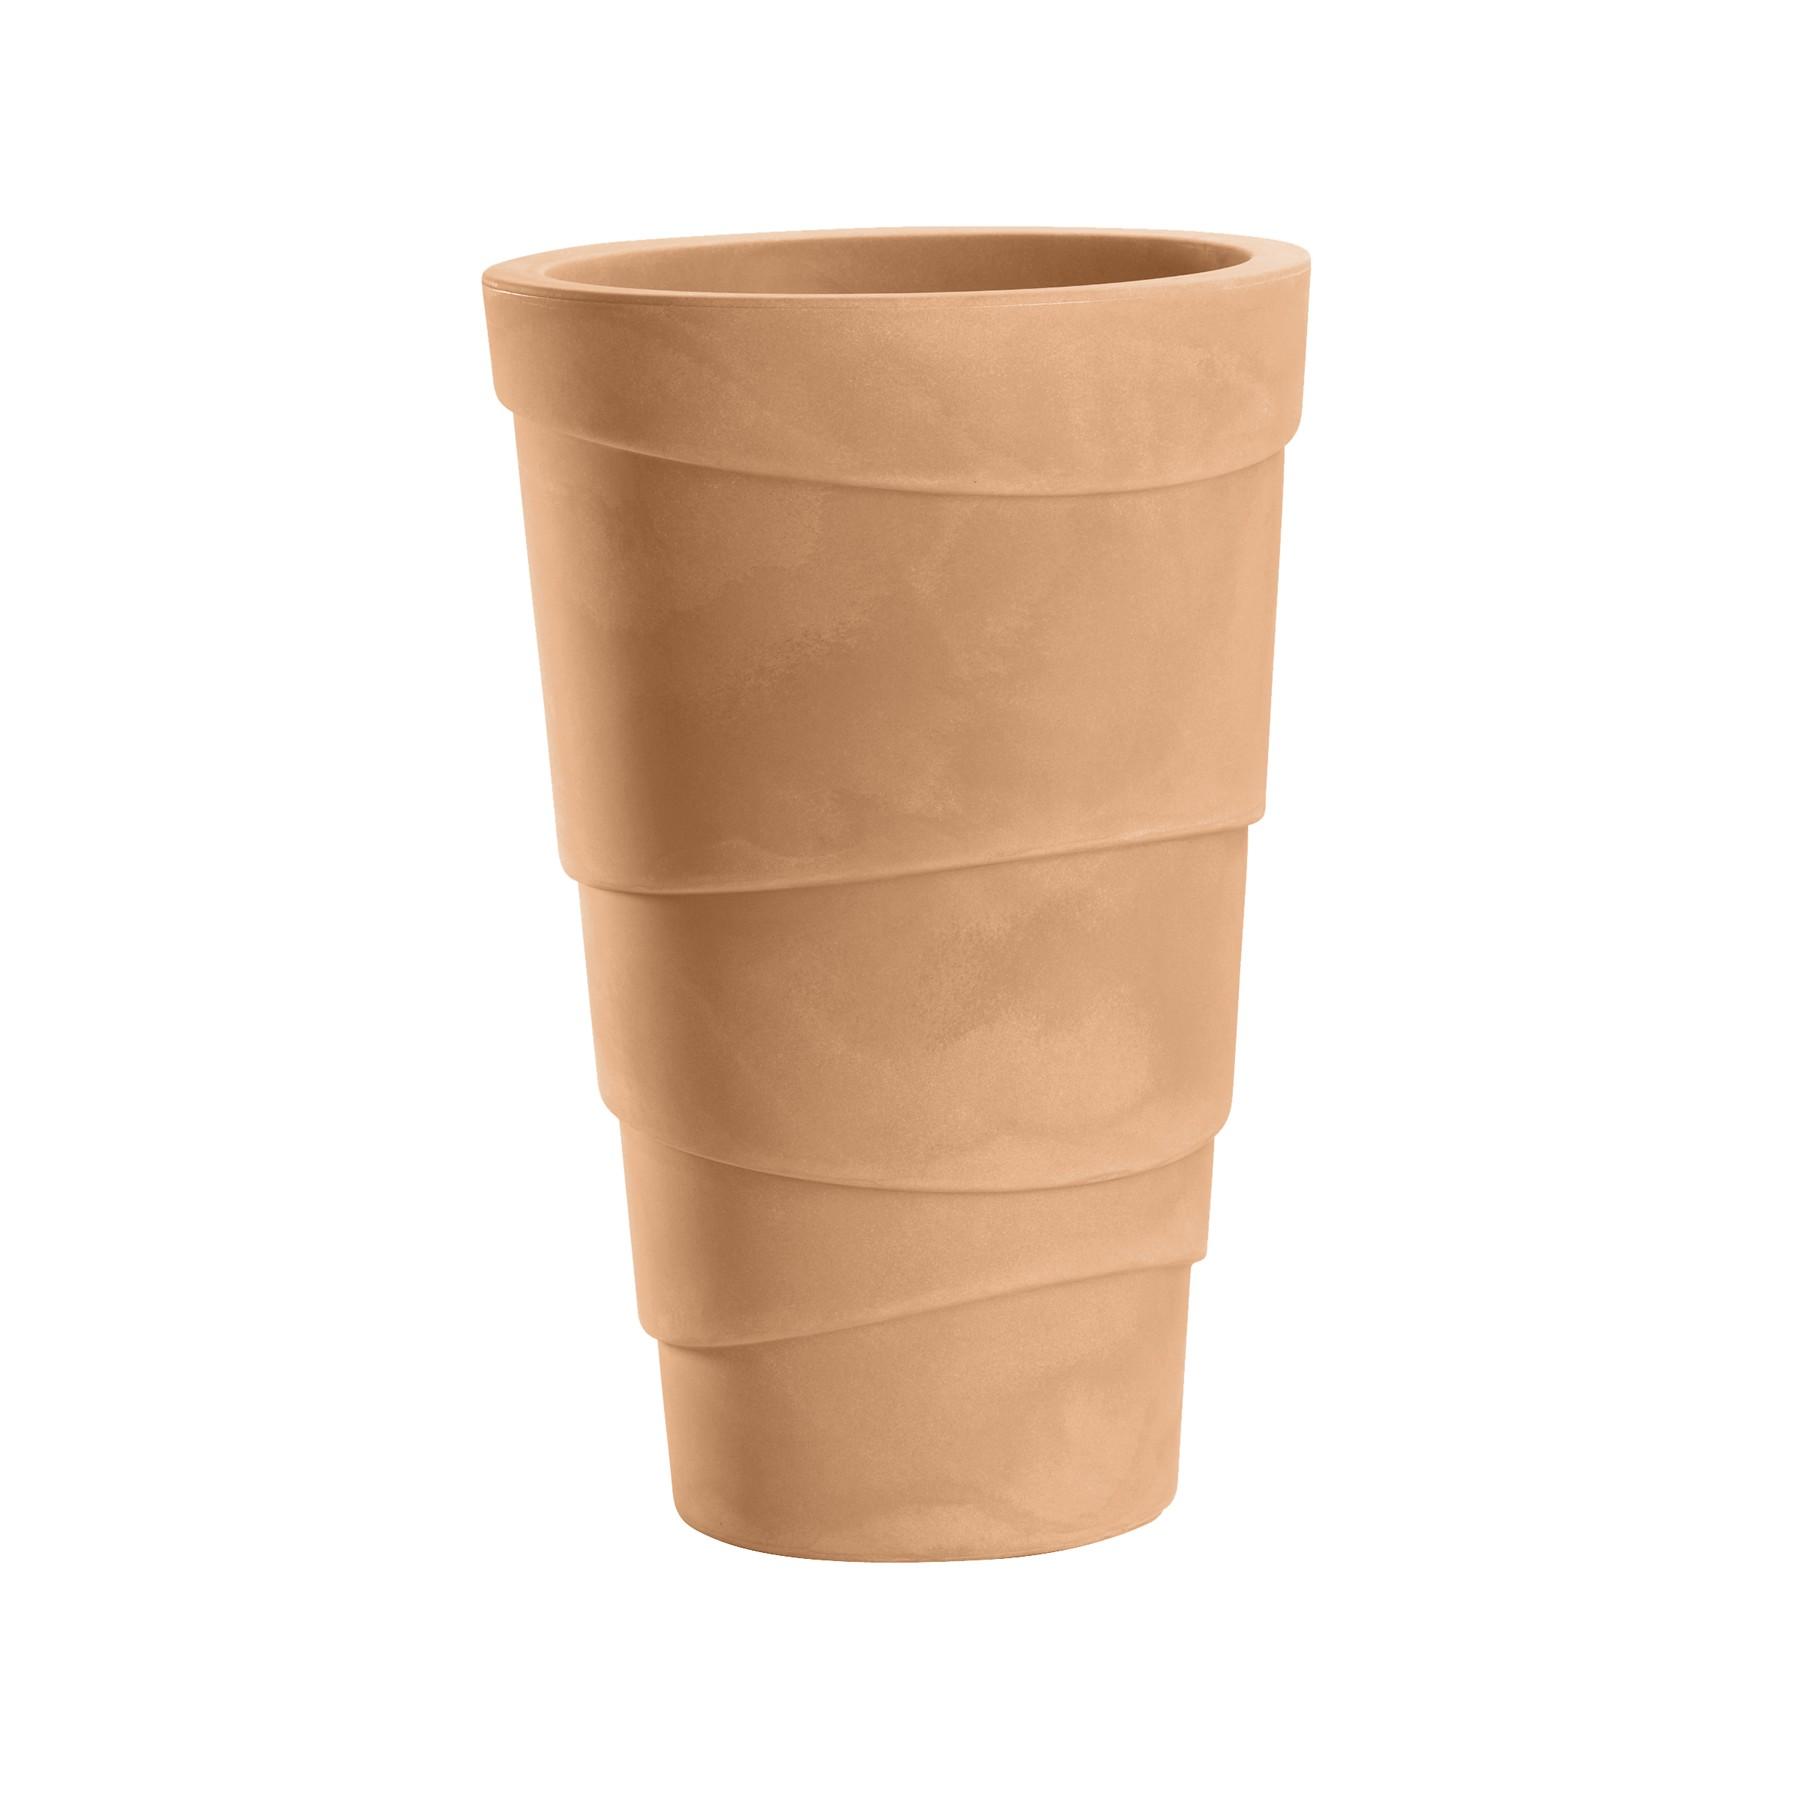 Vasi da giardino e casa in plastica zig zag nicoli - Vaso da giardino ...